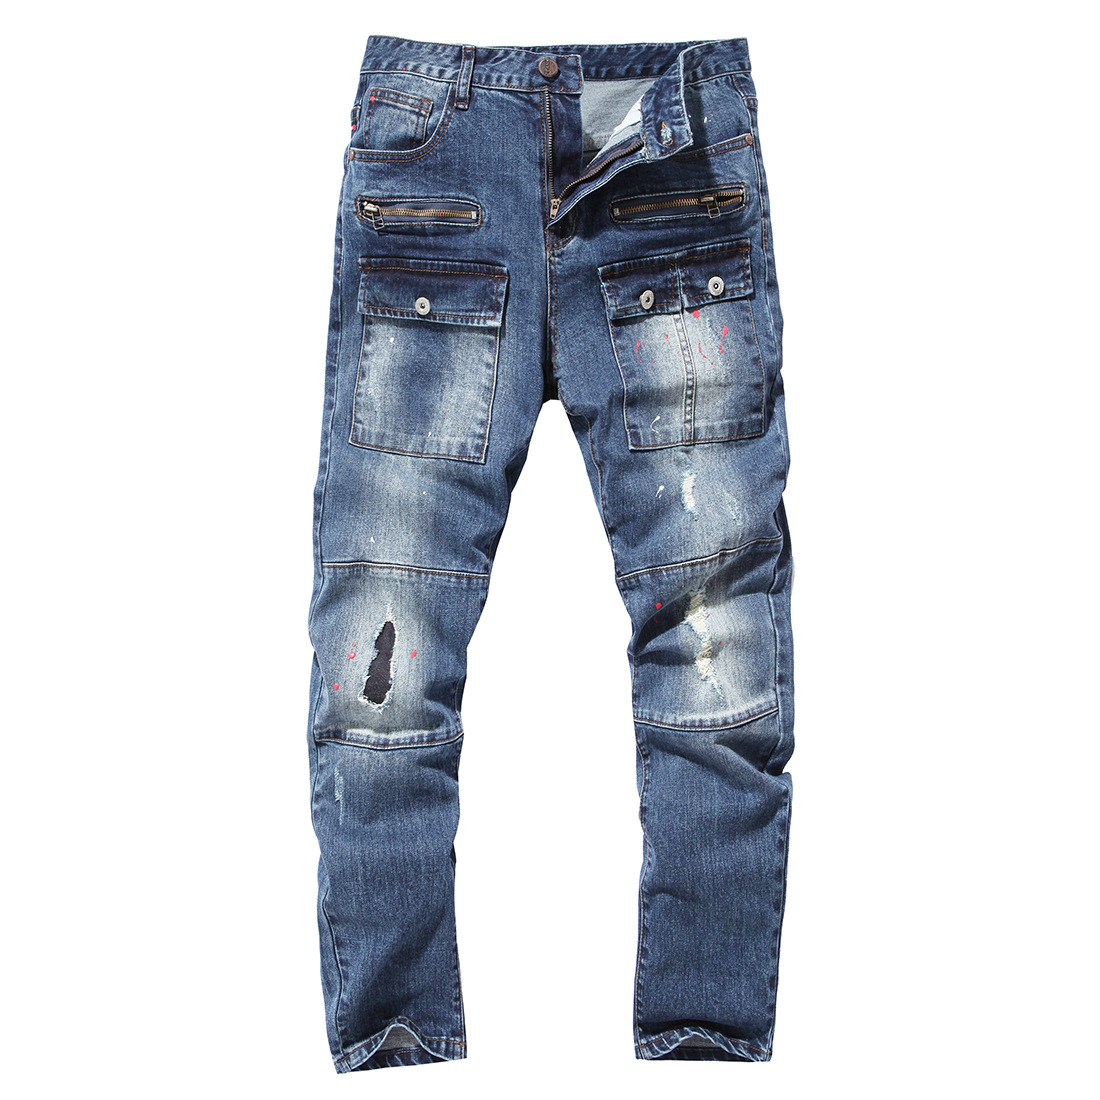 2018 Mens Leg With Hole Straight Slim Biker Denim Jeans Trousers Skinny Pants grey 2015 spring male personality splice skinny pants the trend straight trousers slim long trousers thin men skinny jeans